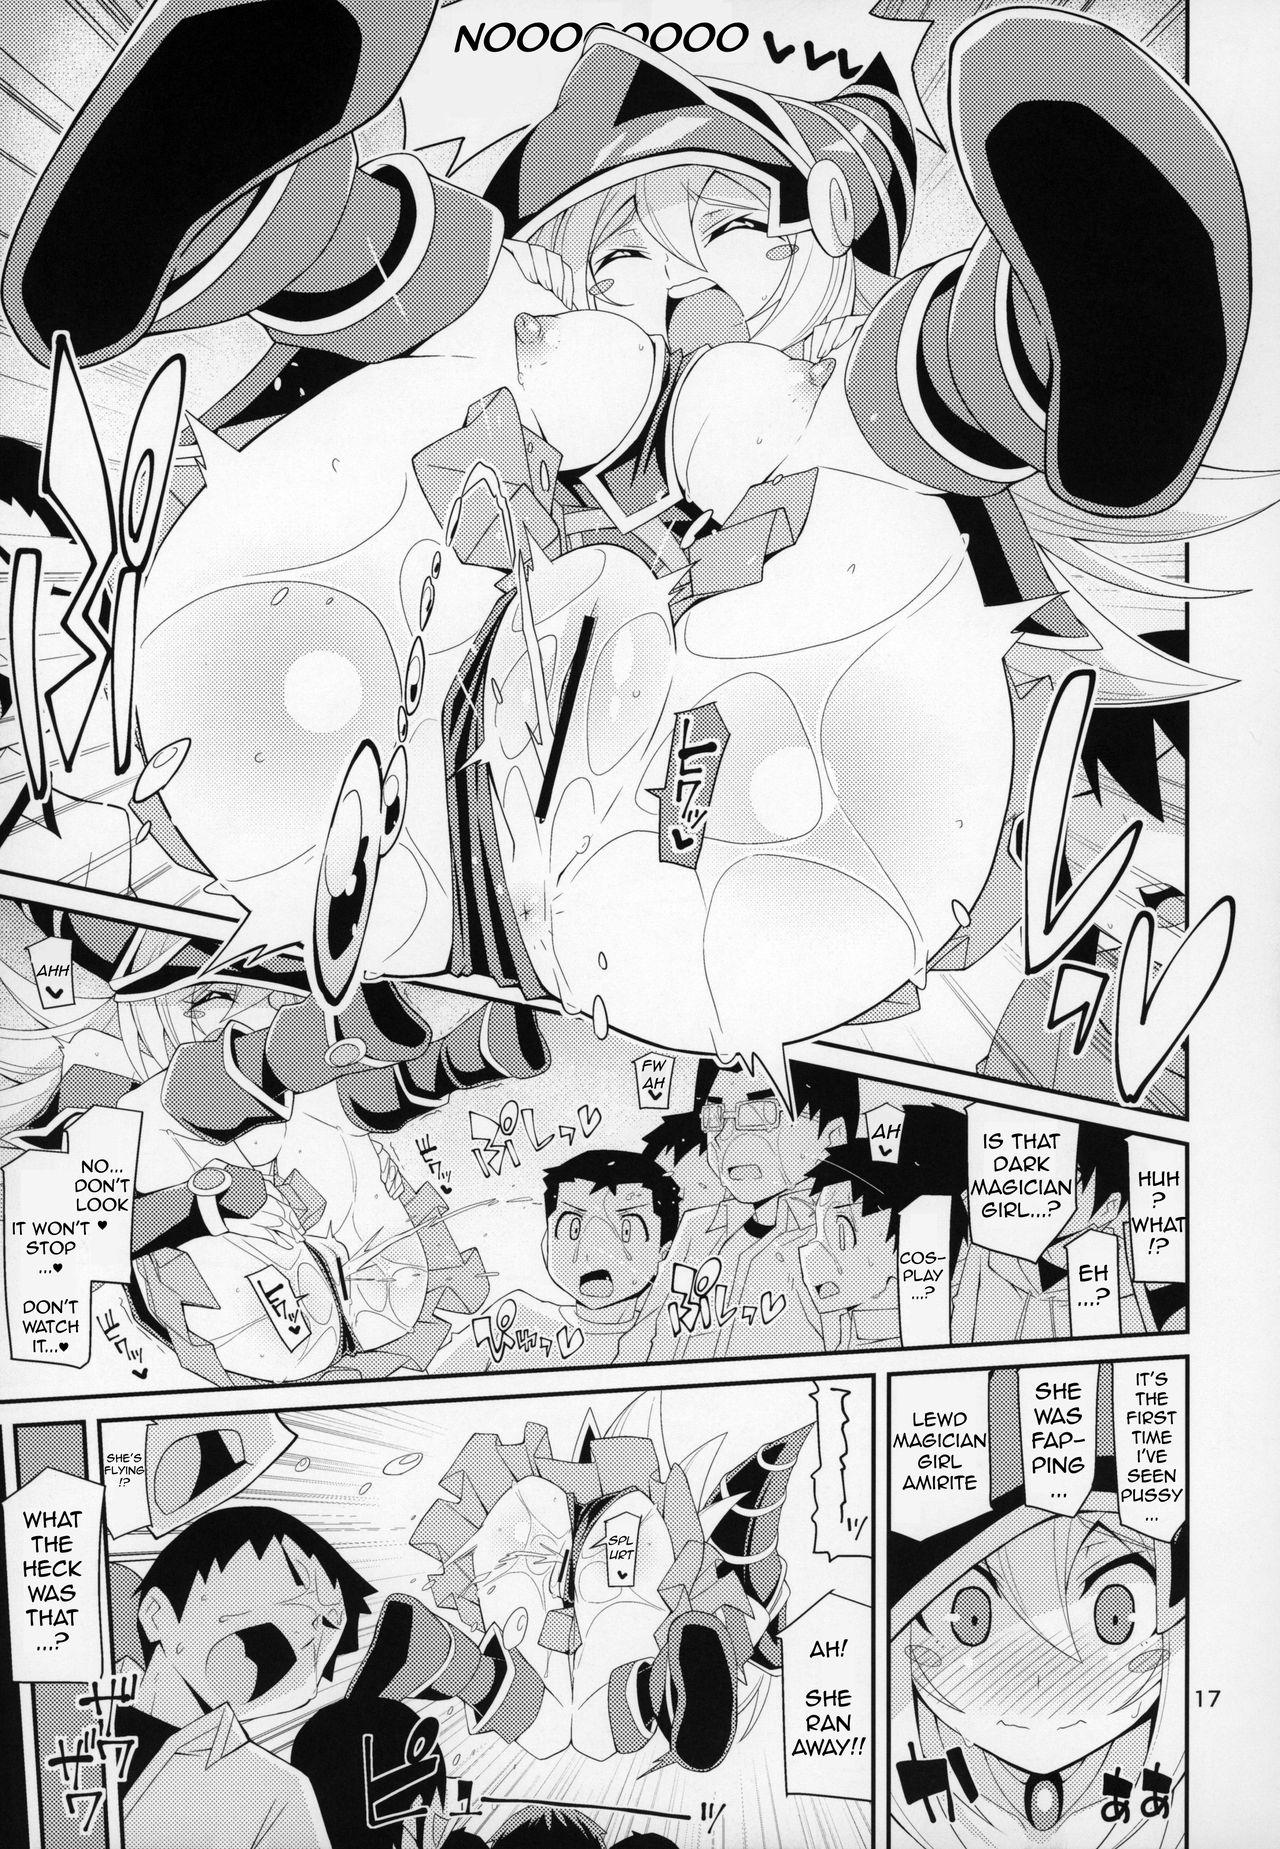 [4or5 Works (Chicago)] BMG -Shimobe- ga Iru Seikatsu | Sex Life with -Servant- BMG (Yu-Gi-Oh!) [English] [AdmiralMoe] 15